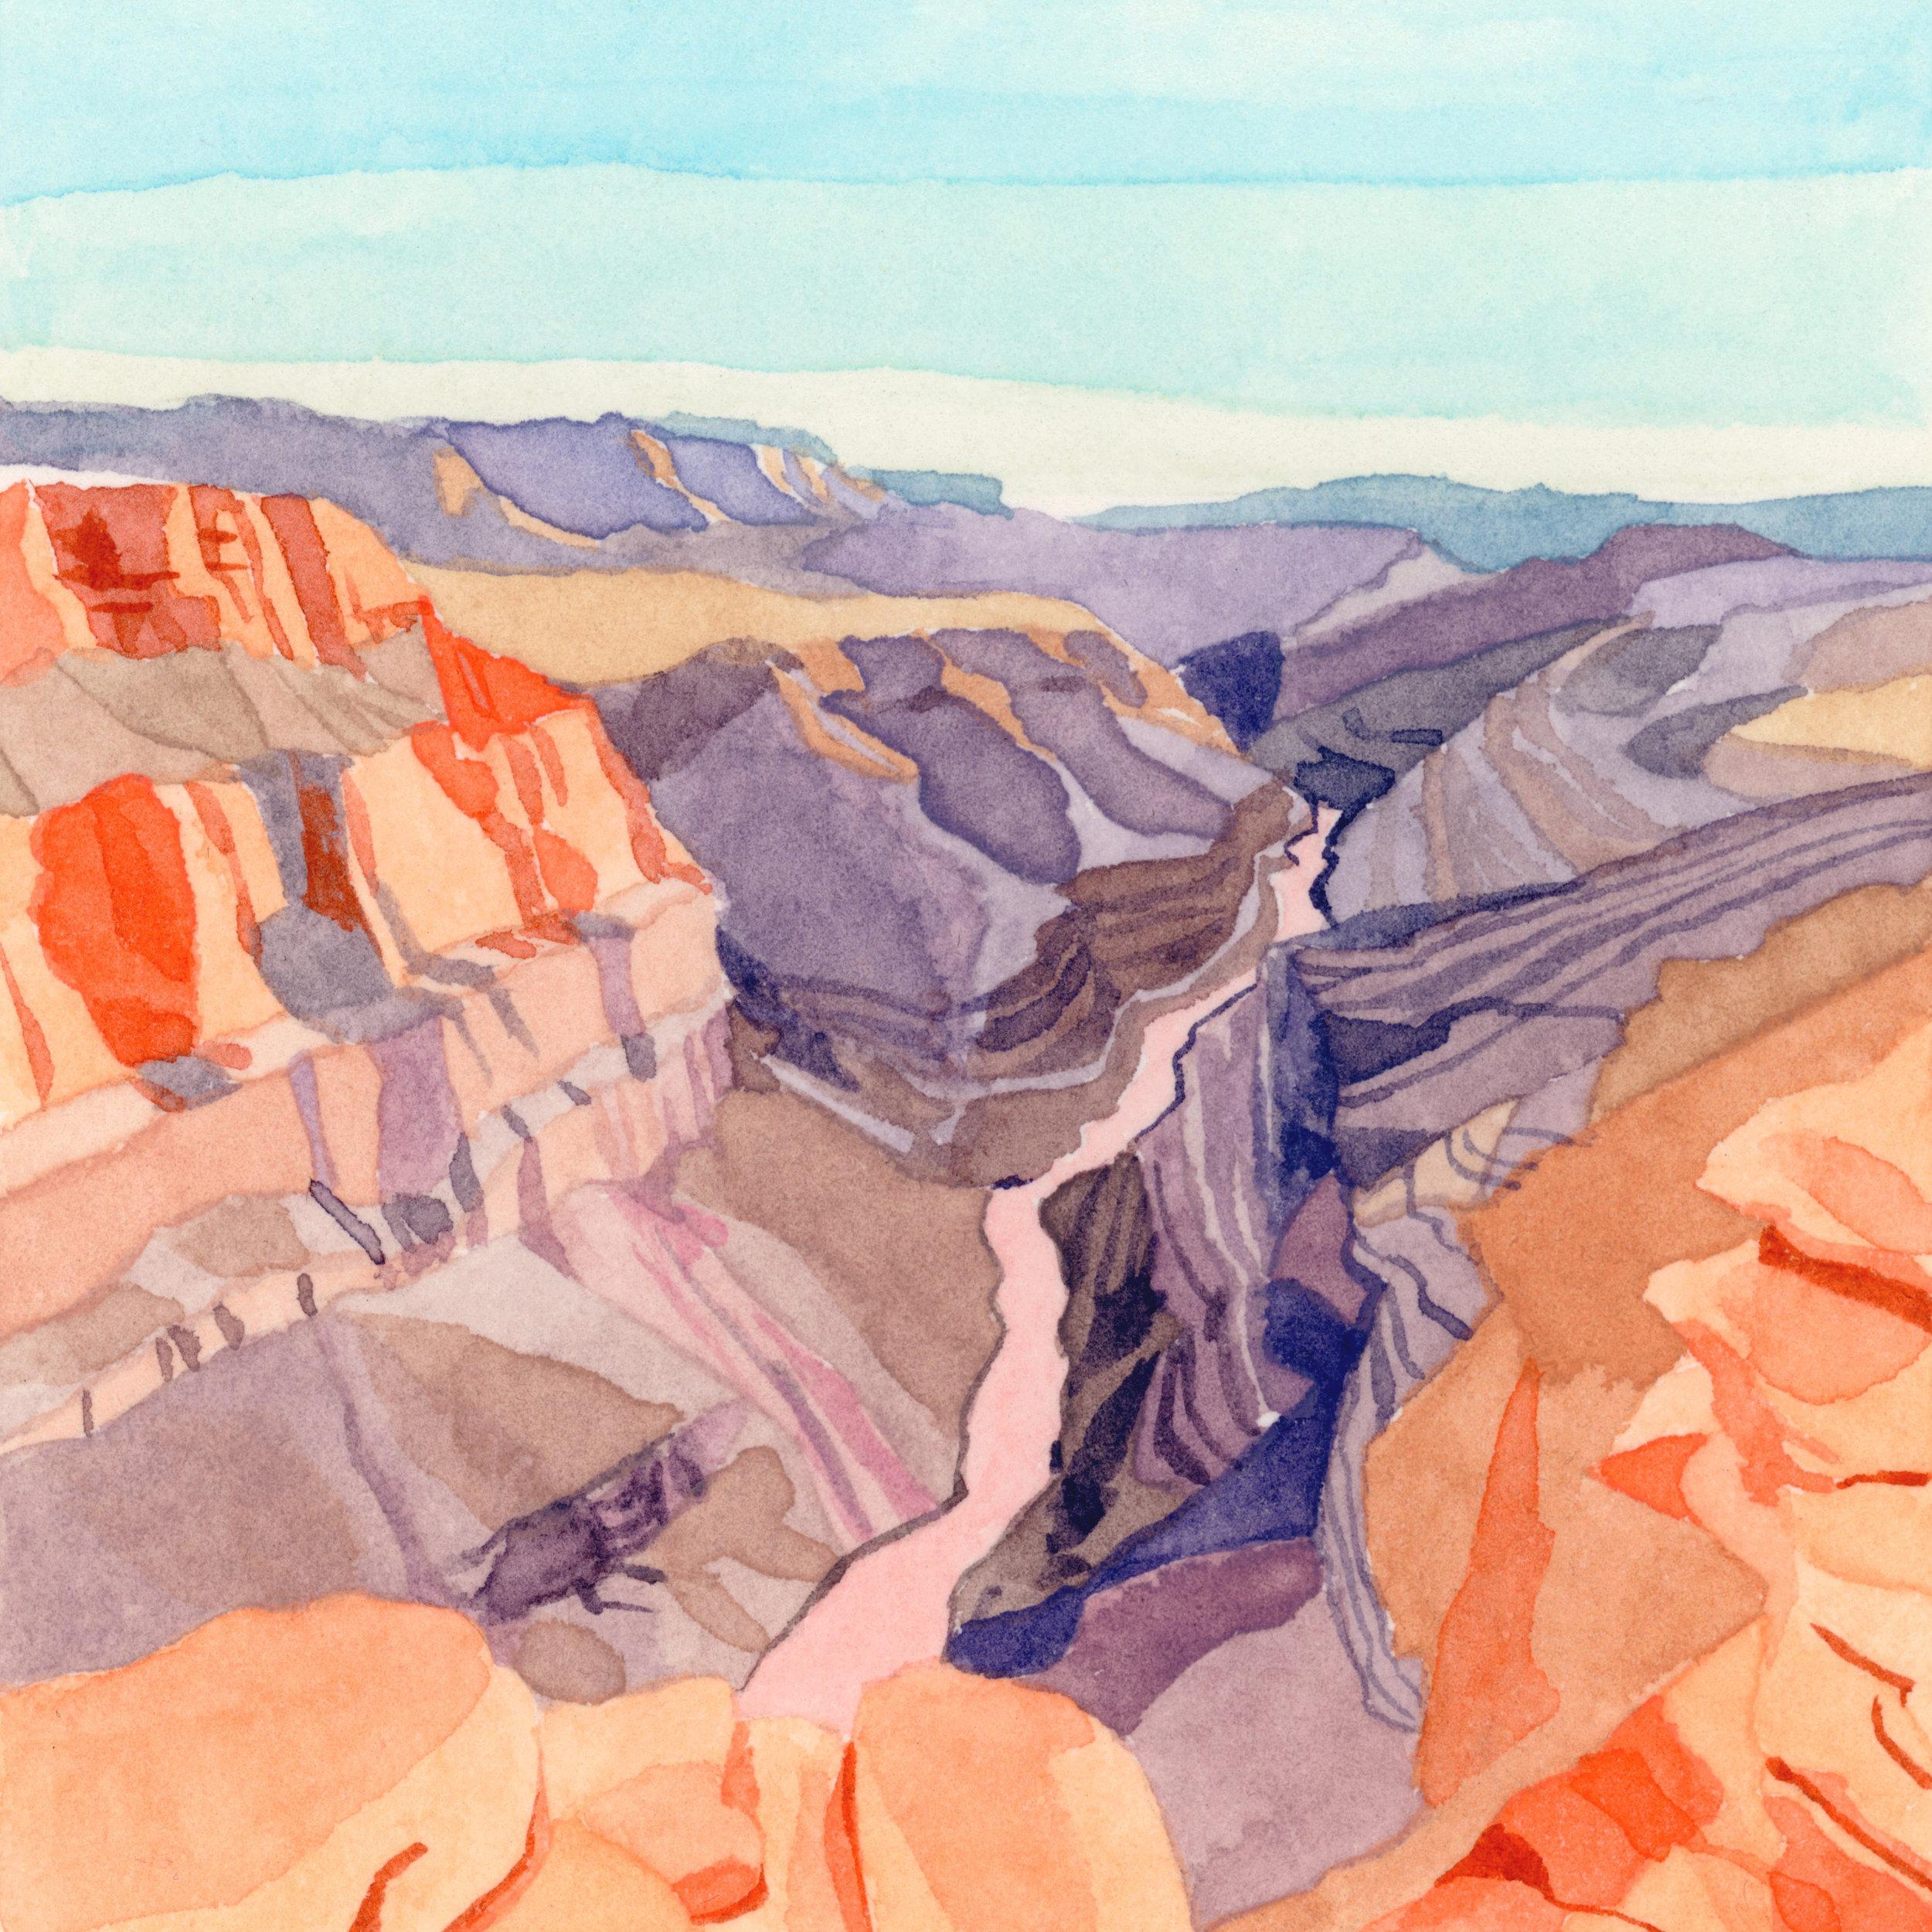 grand-canyon-lrg.jpg